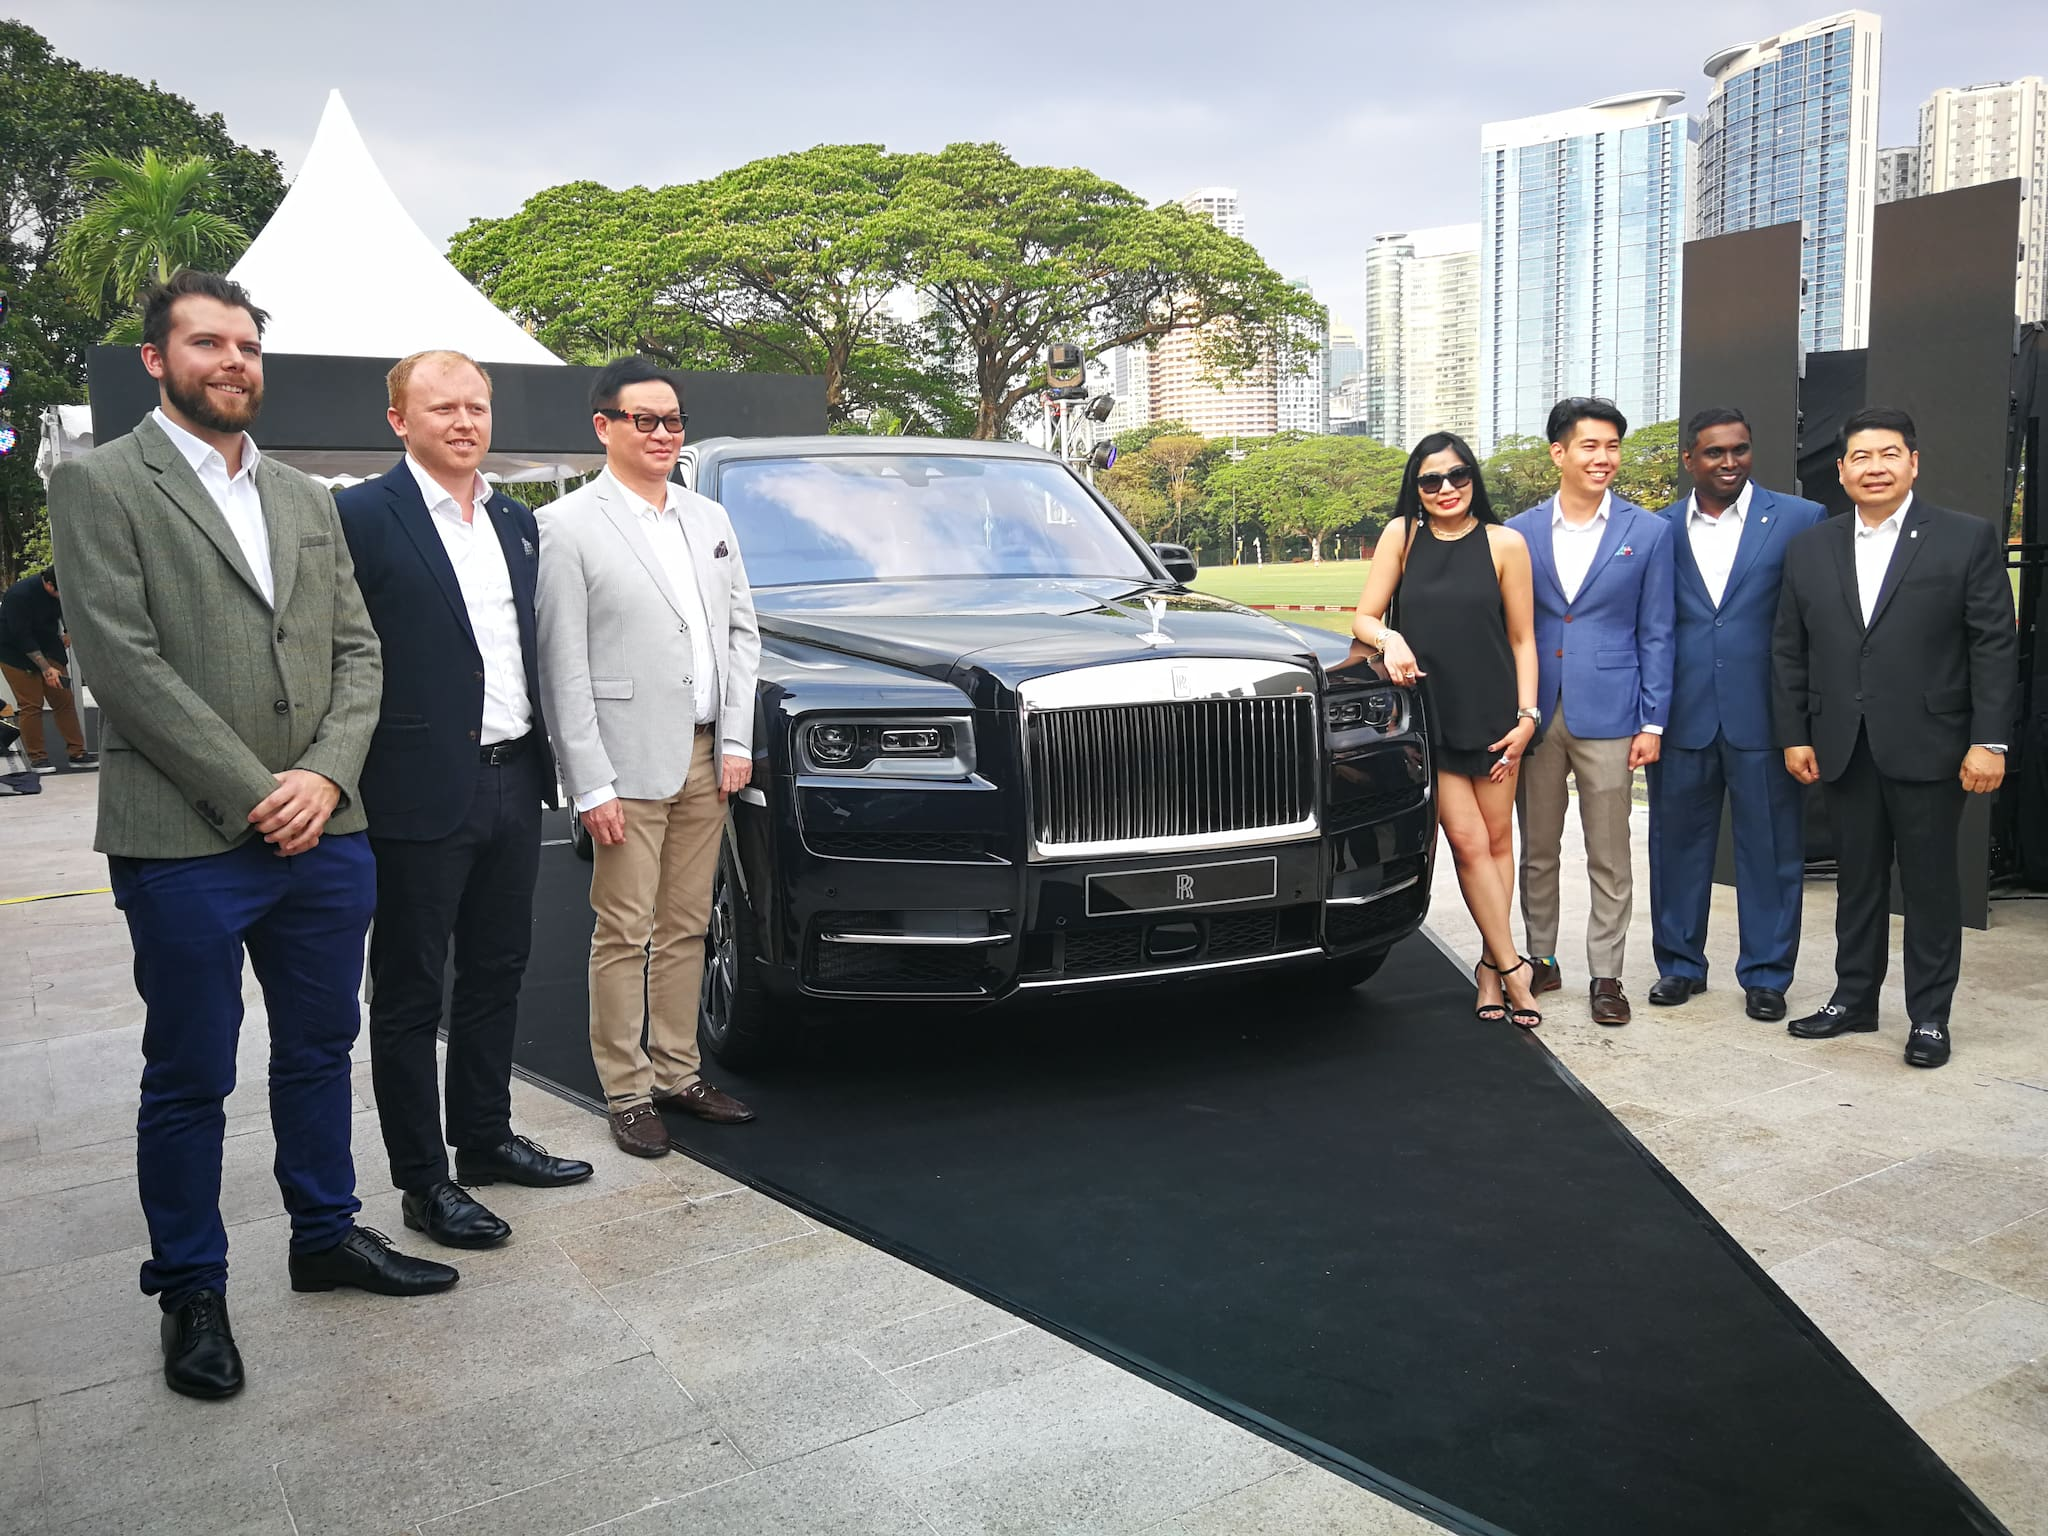 Rolls-Royce PH Rolls Out Poshest SUV in Cullinan